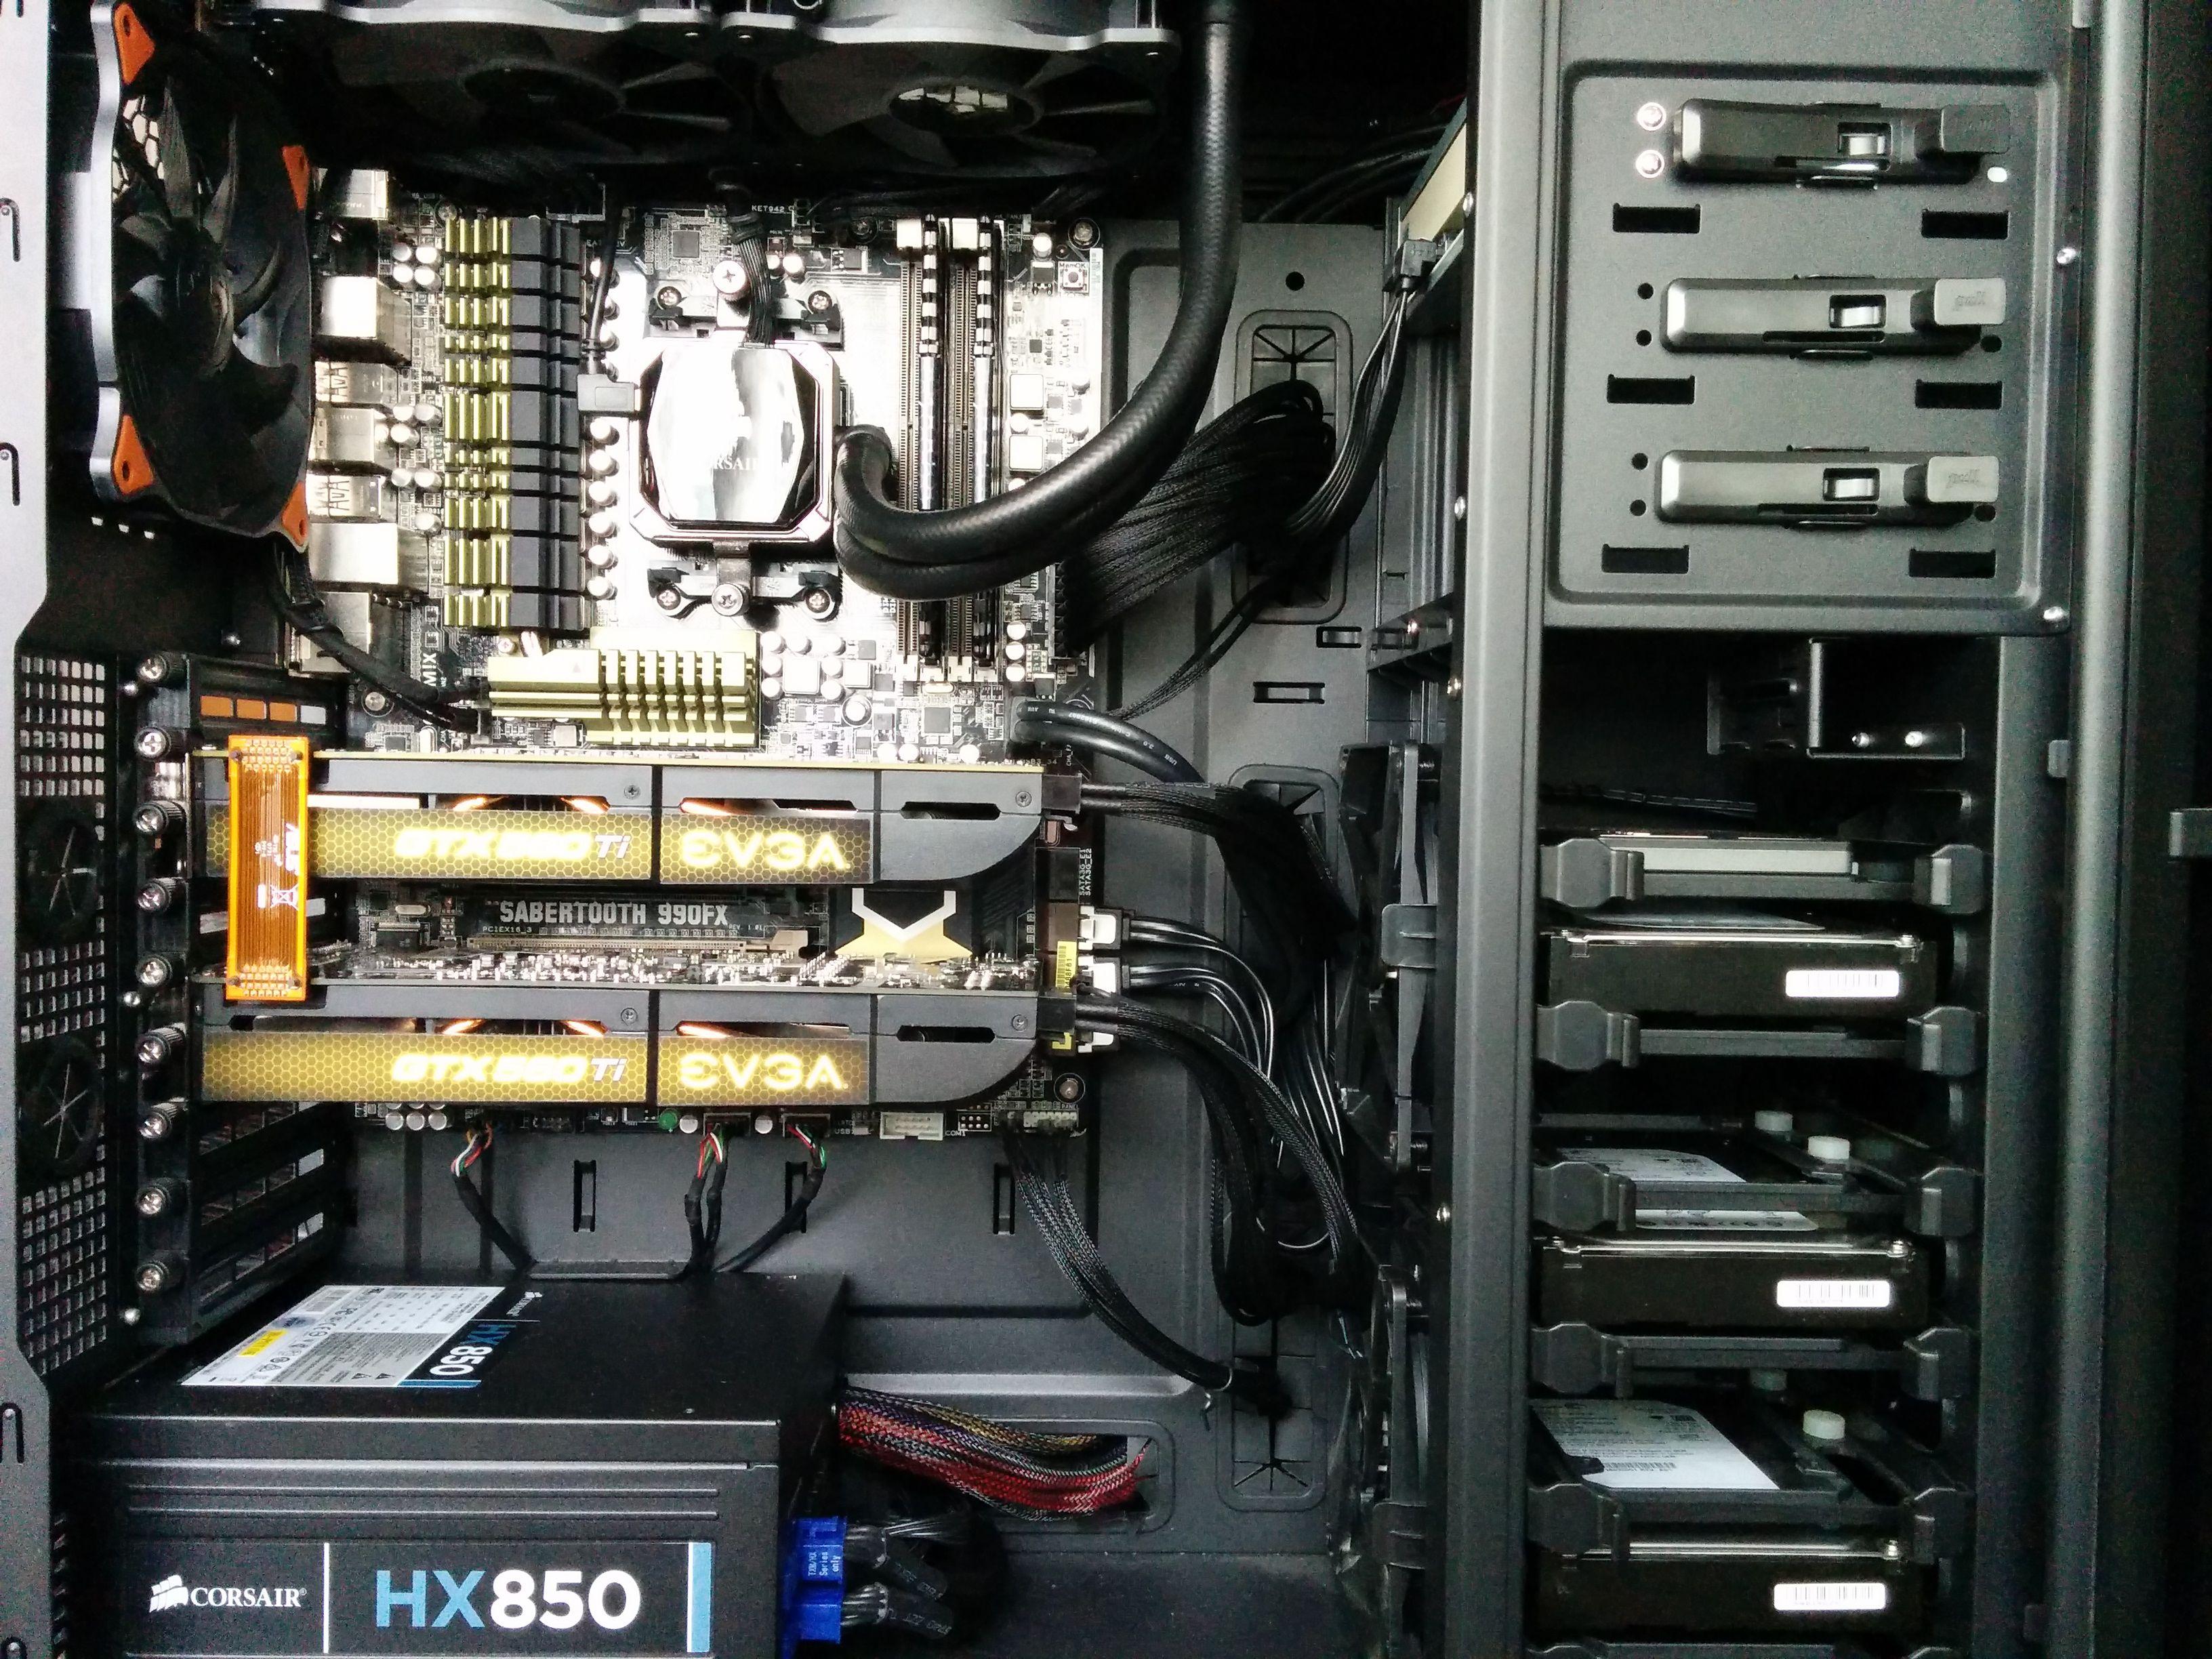 antec p280 case liquid cooling from corsair s h100i series antec p280 case liquid cooling from corsair s h100i series